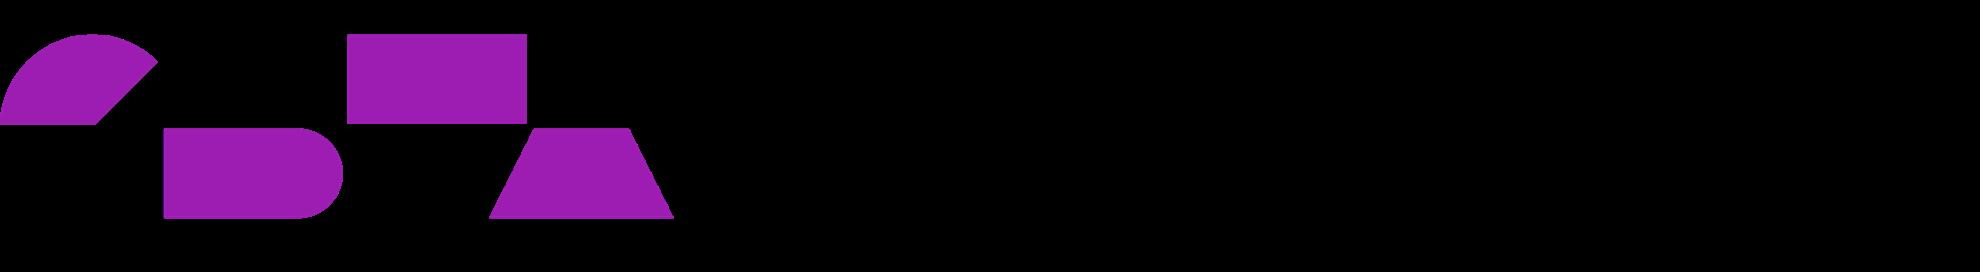 CSTA Minnesota logo